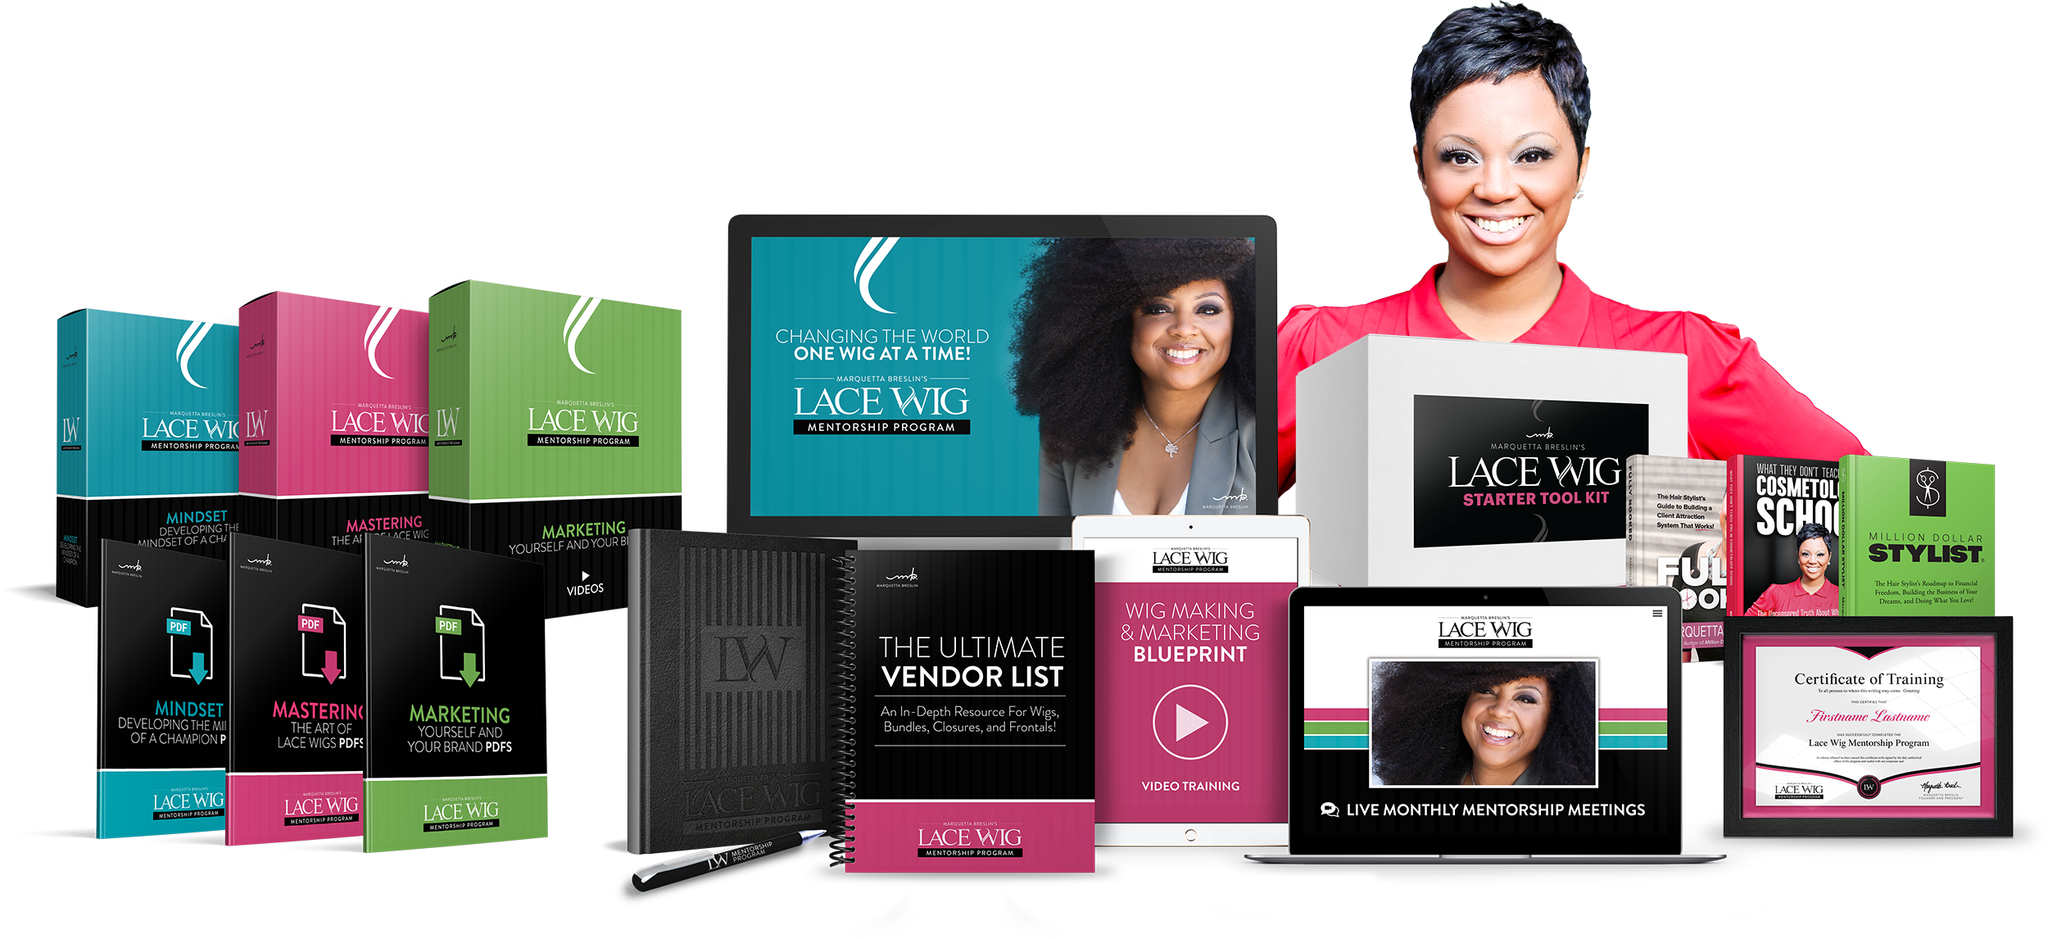 Lace Wig Mentorship Program